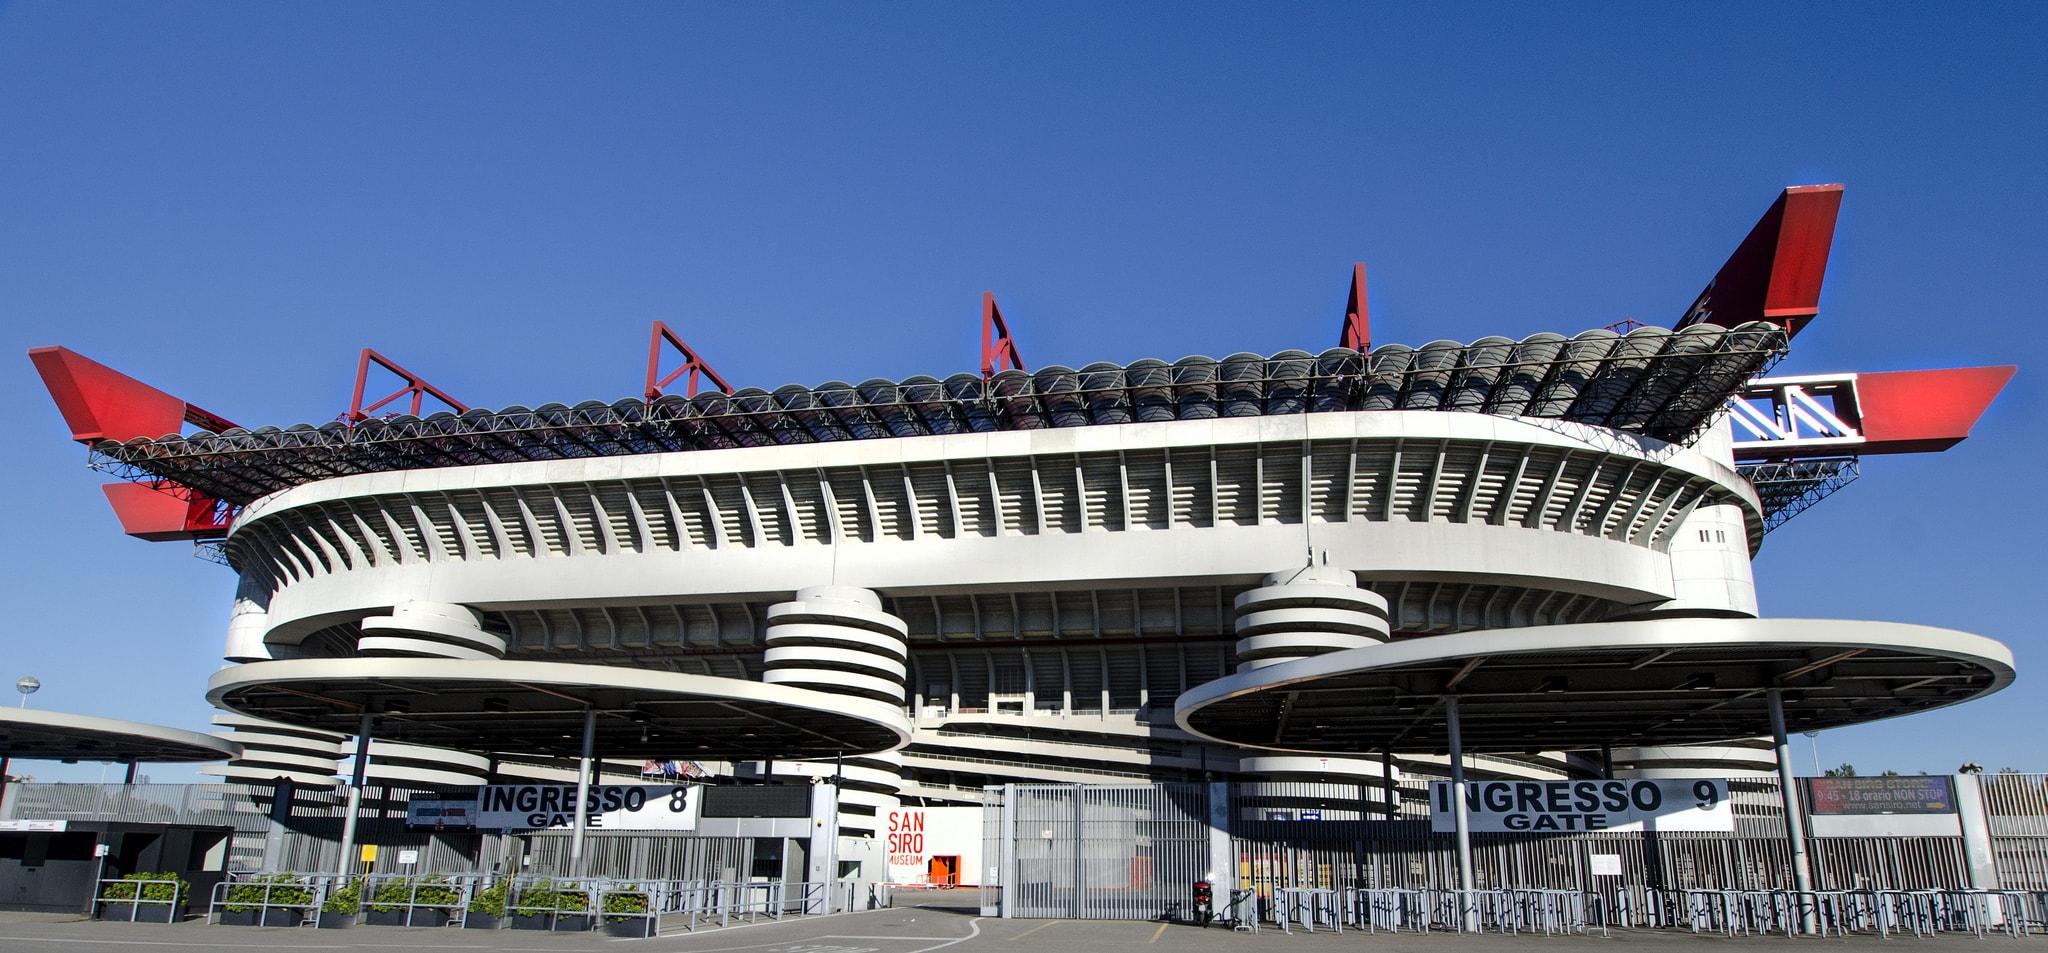 San Siro football stadium, Milan | © Jose Luis Hidalgo R./Flickr